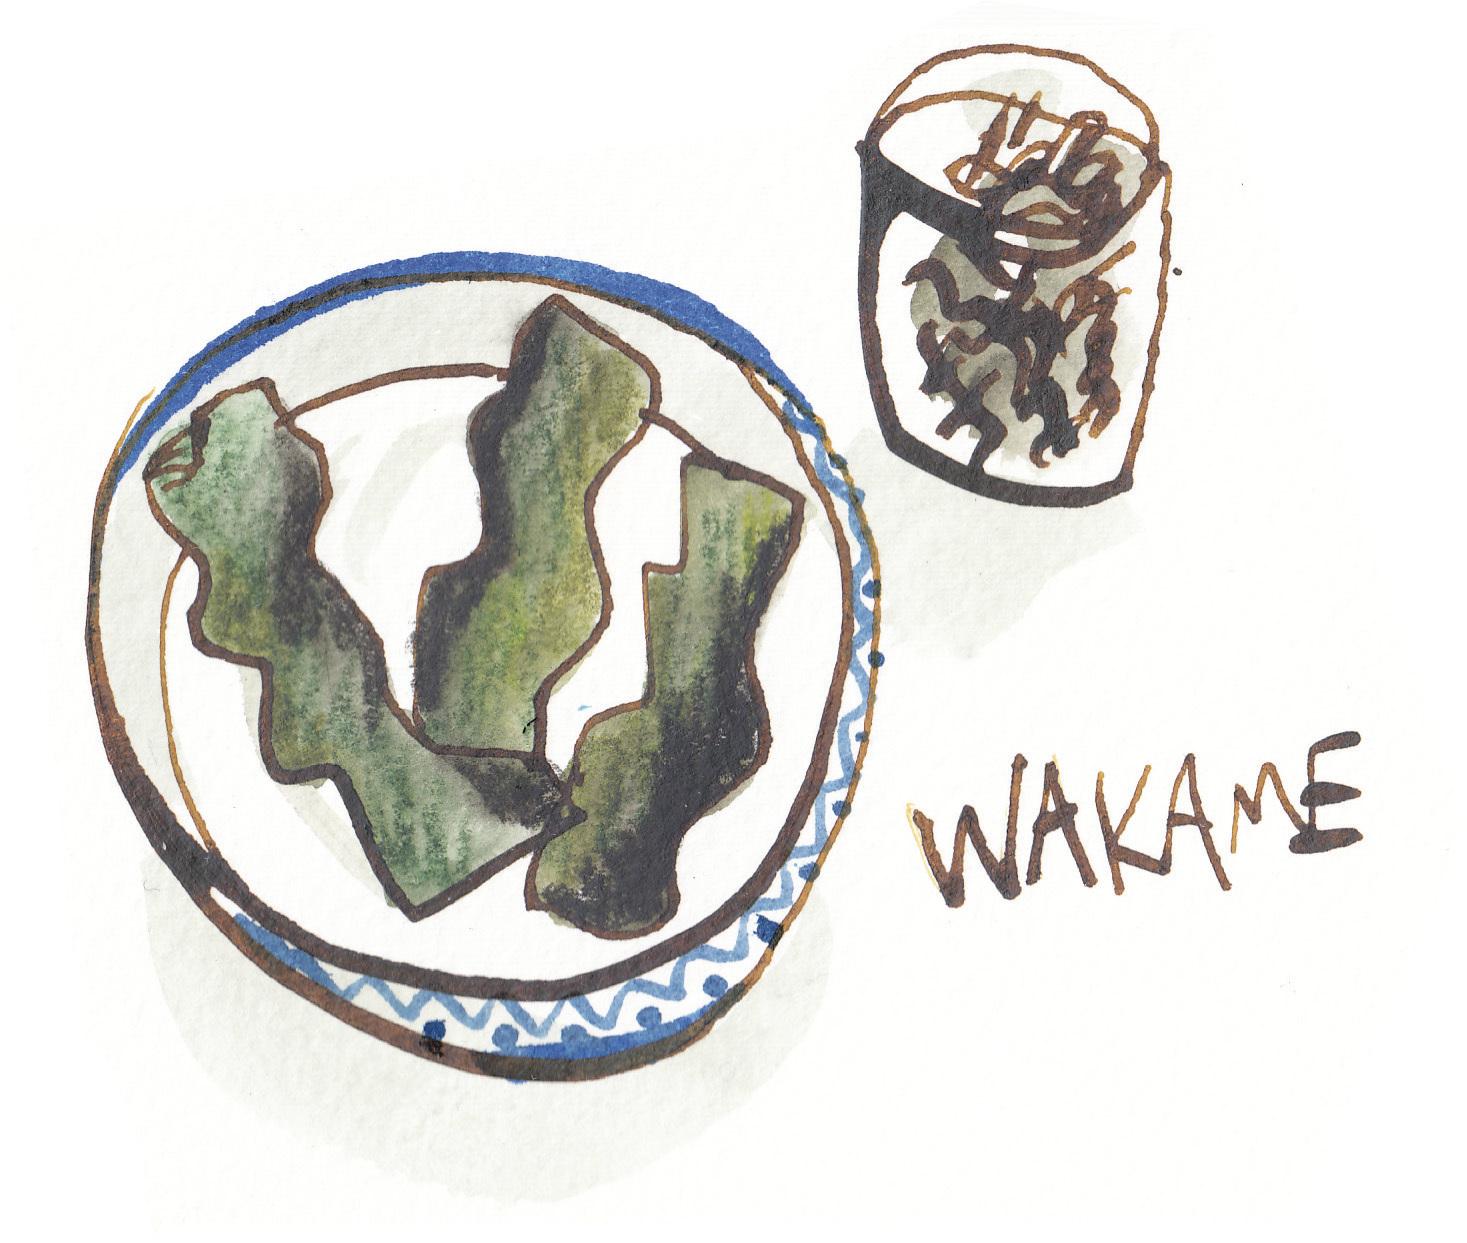 Wakame.